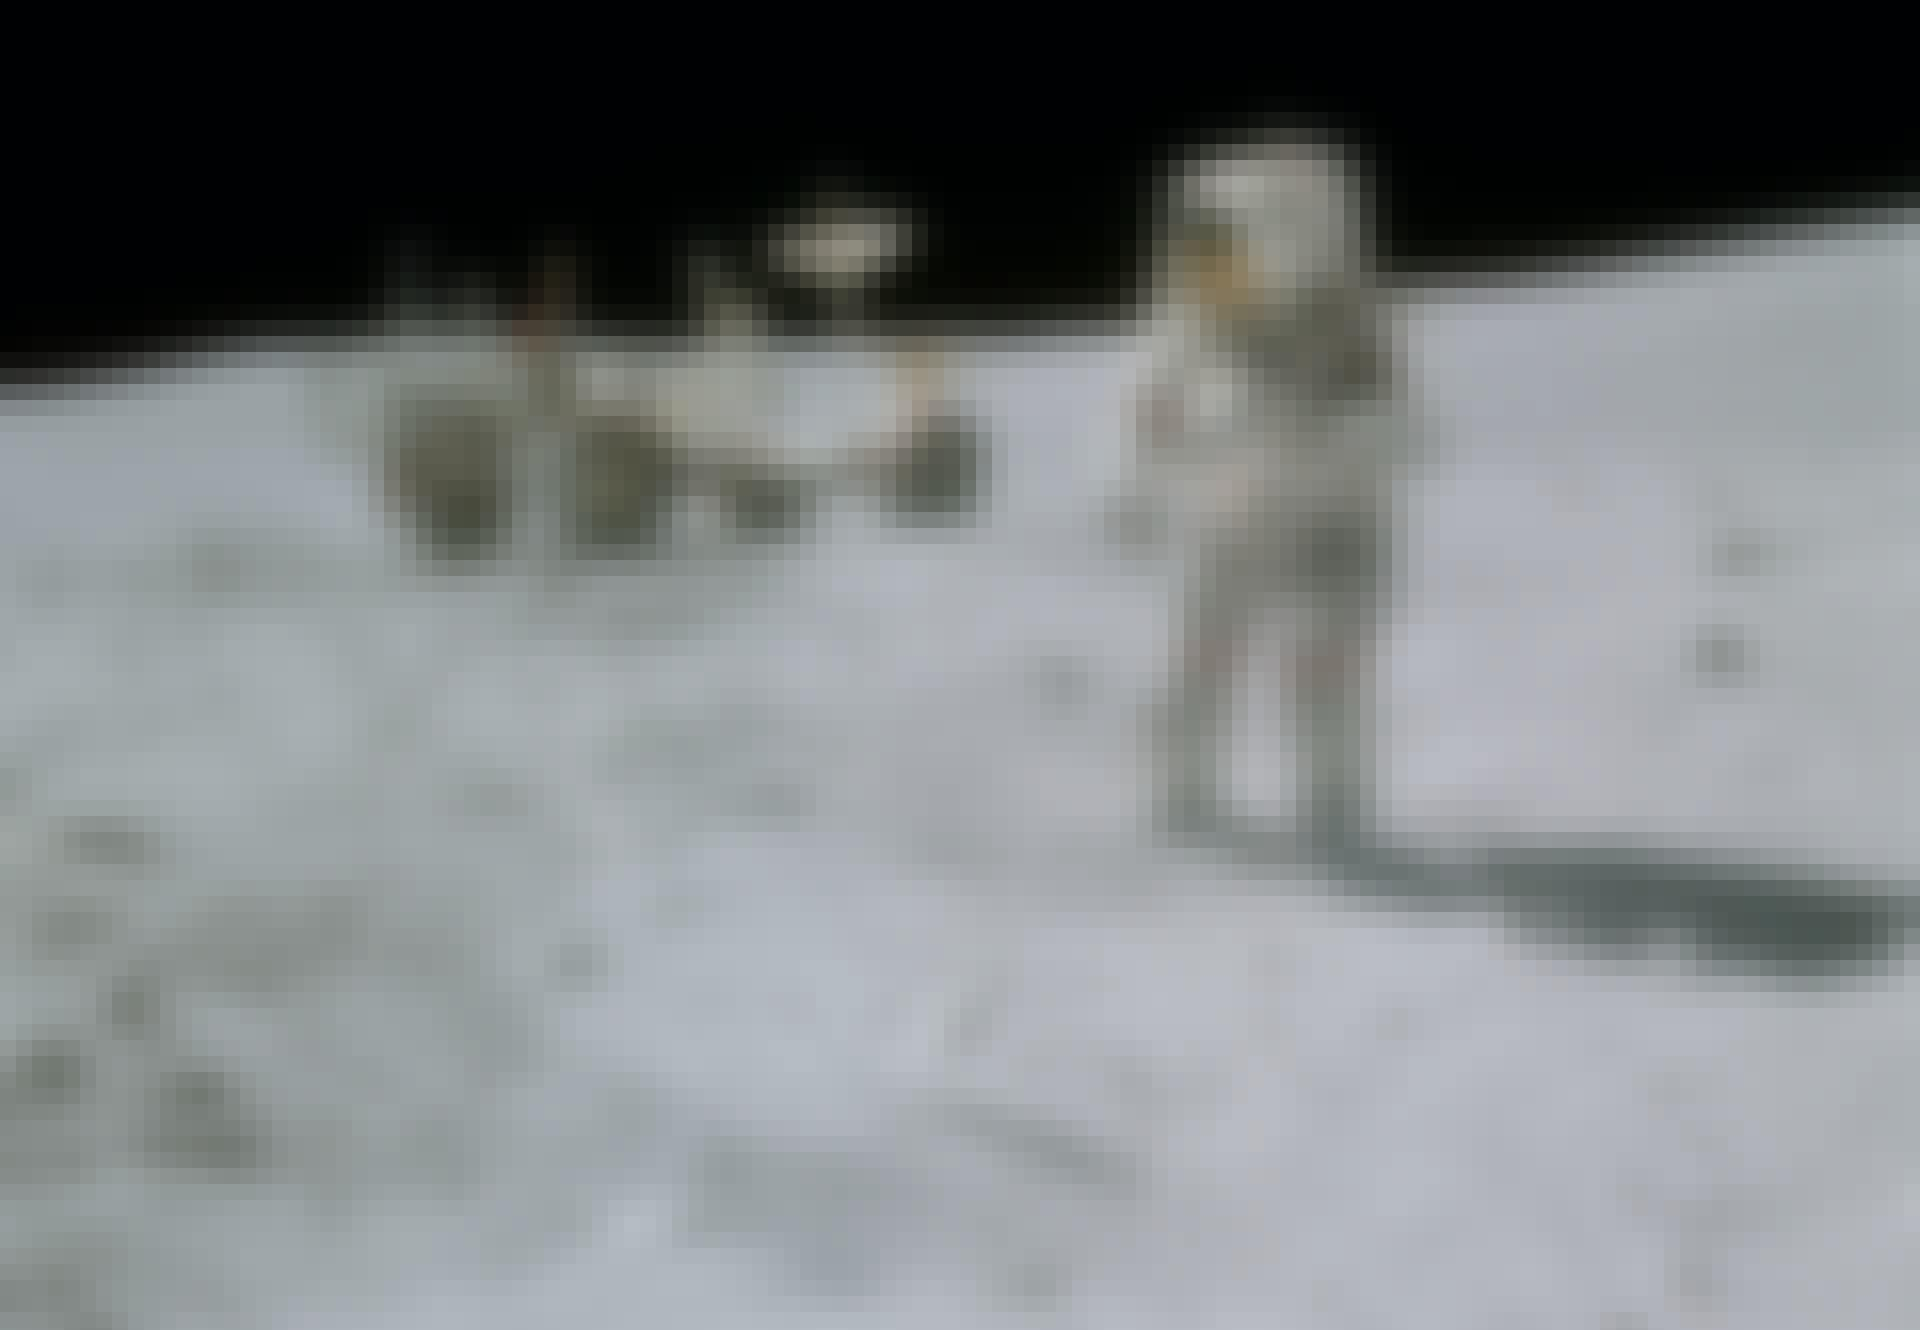 Maan, John Young, Apollo 16